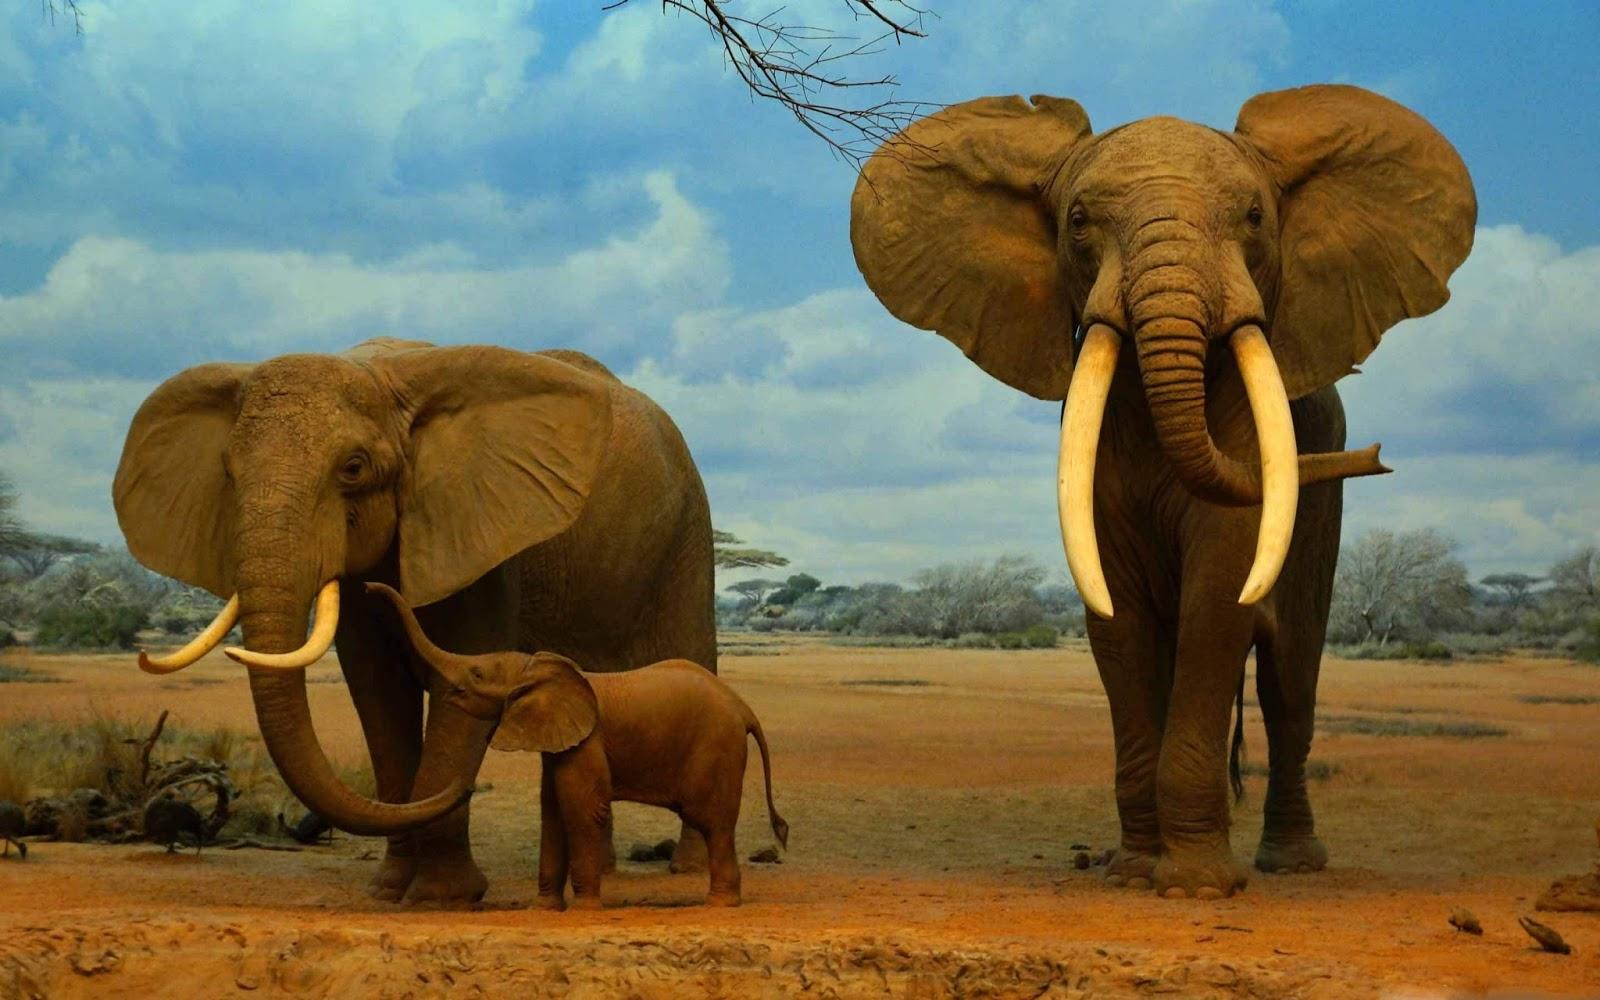 Ultra HD 4K Elephant Wallpaper Download - Free New ...